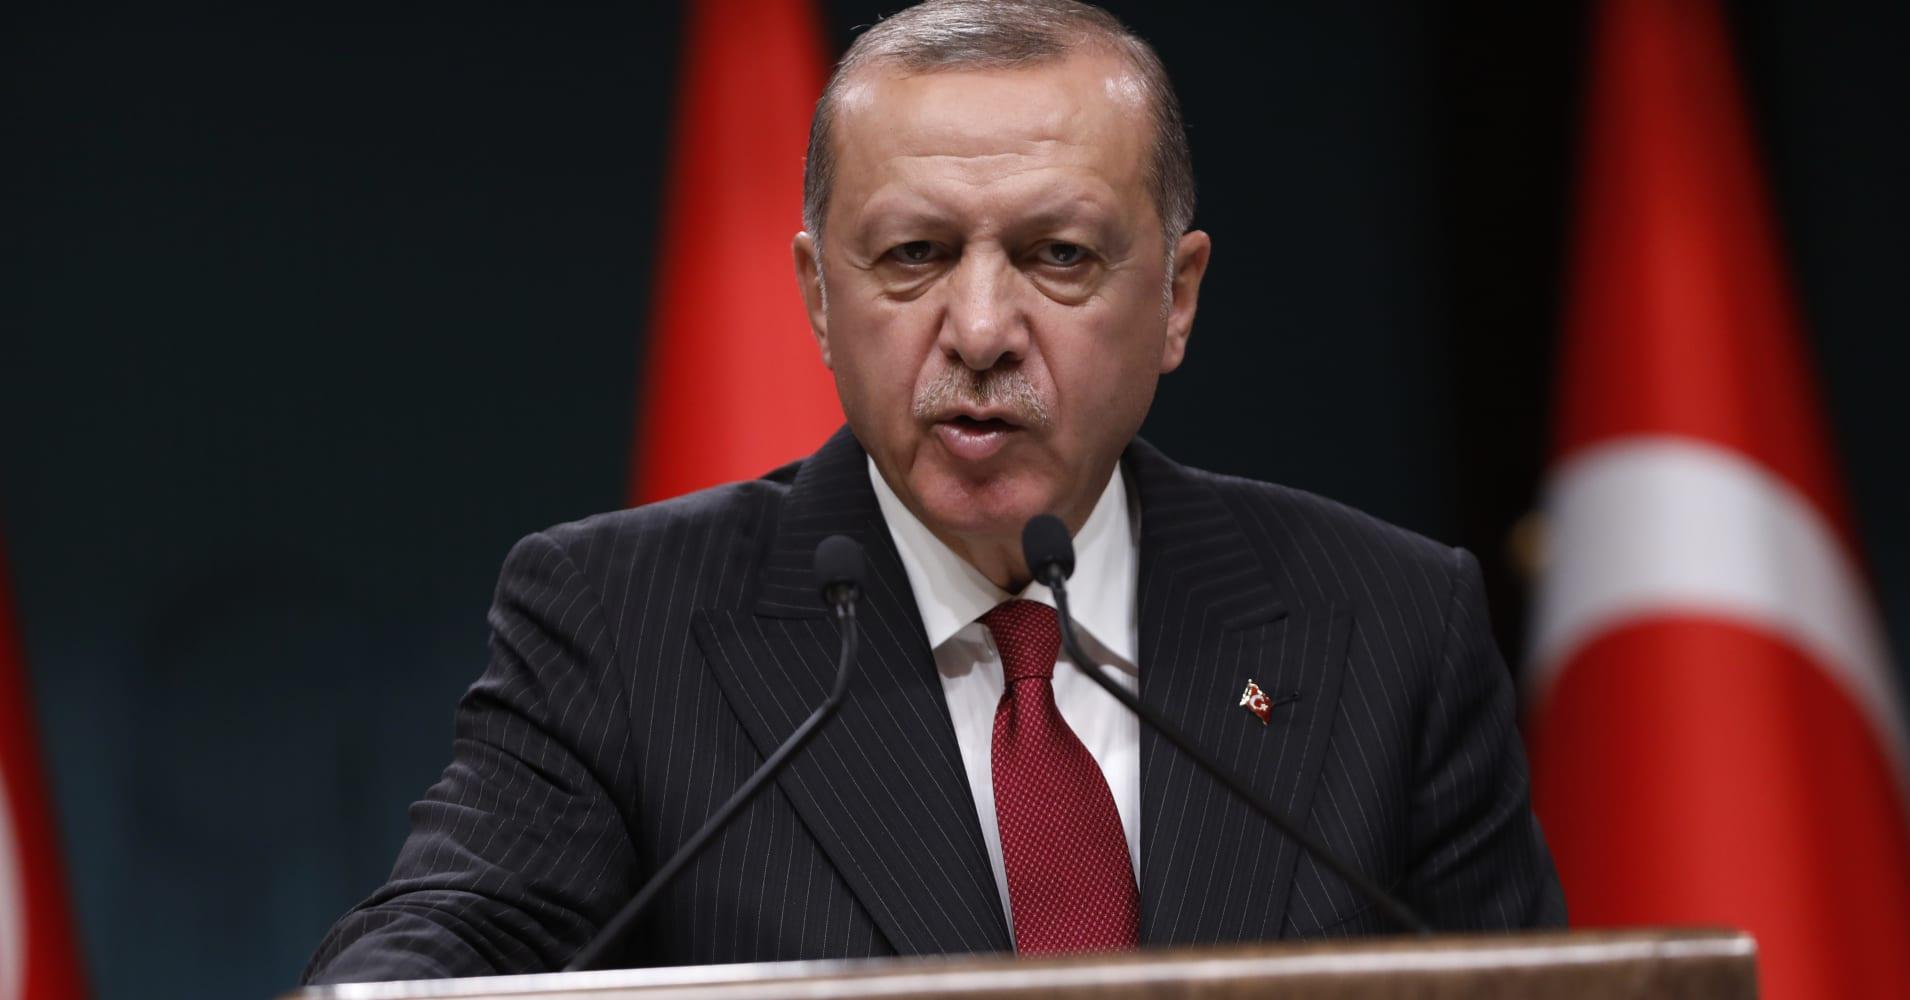 Turkey's Erdogan says he'll reveal the 'naked truth' on Khashoggi's death